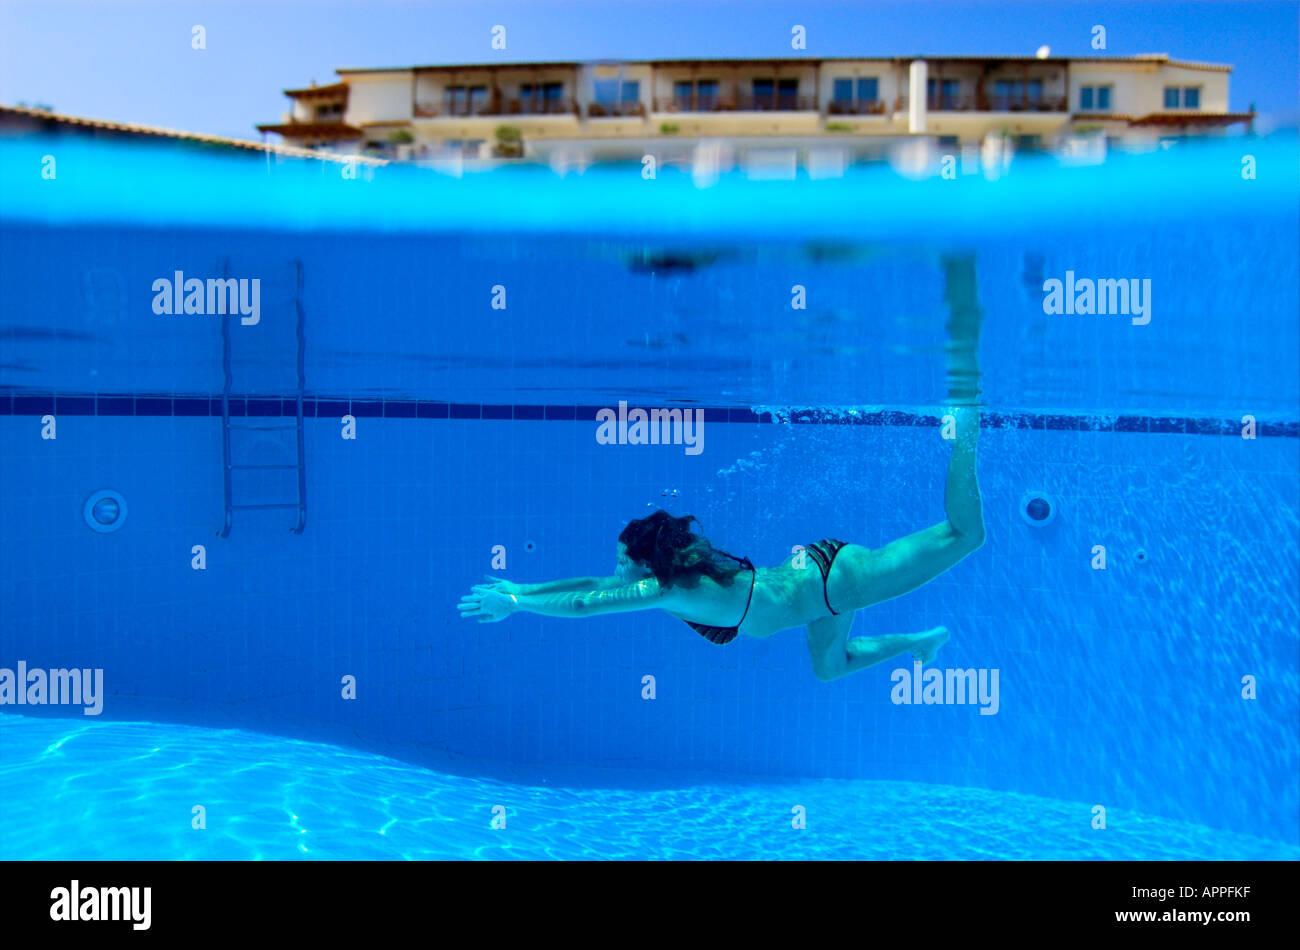 Woman In Bikini Underwater In Swimming Pool Hotel Above Water Stock Photo Royalty Free Image